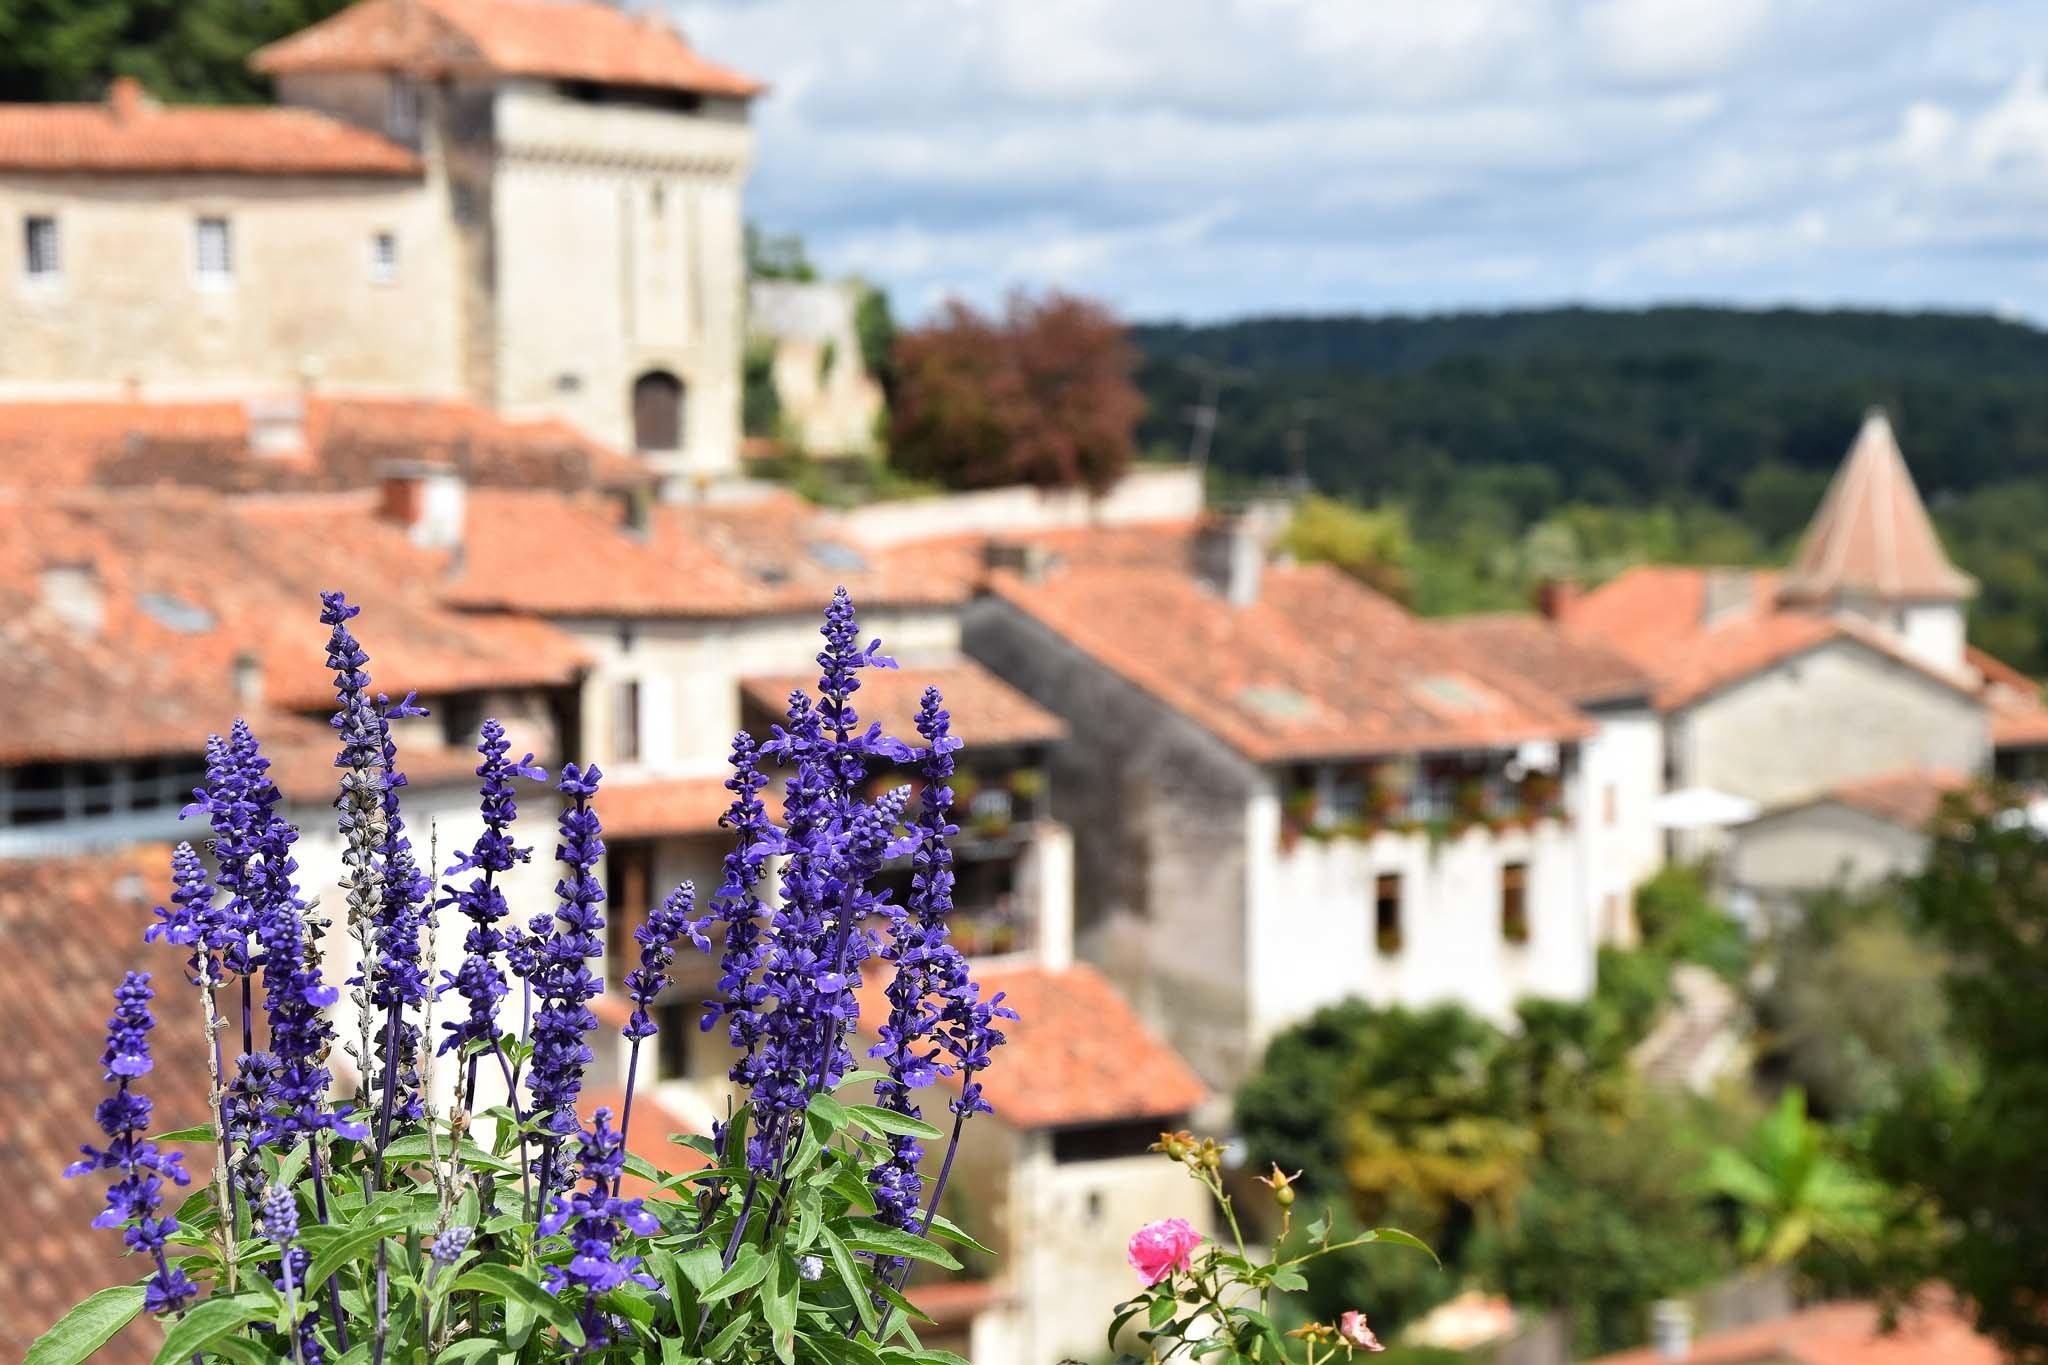 Aubeterre-sur-Dronne scenery with lavender